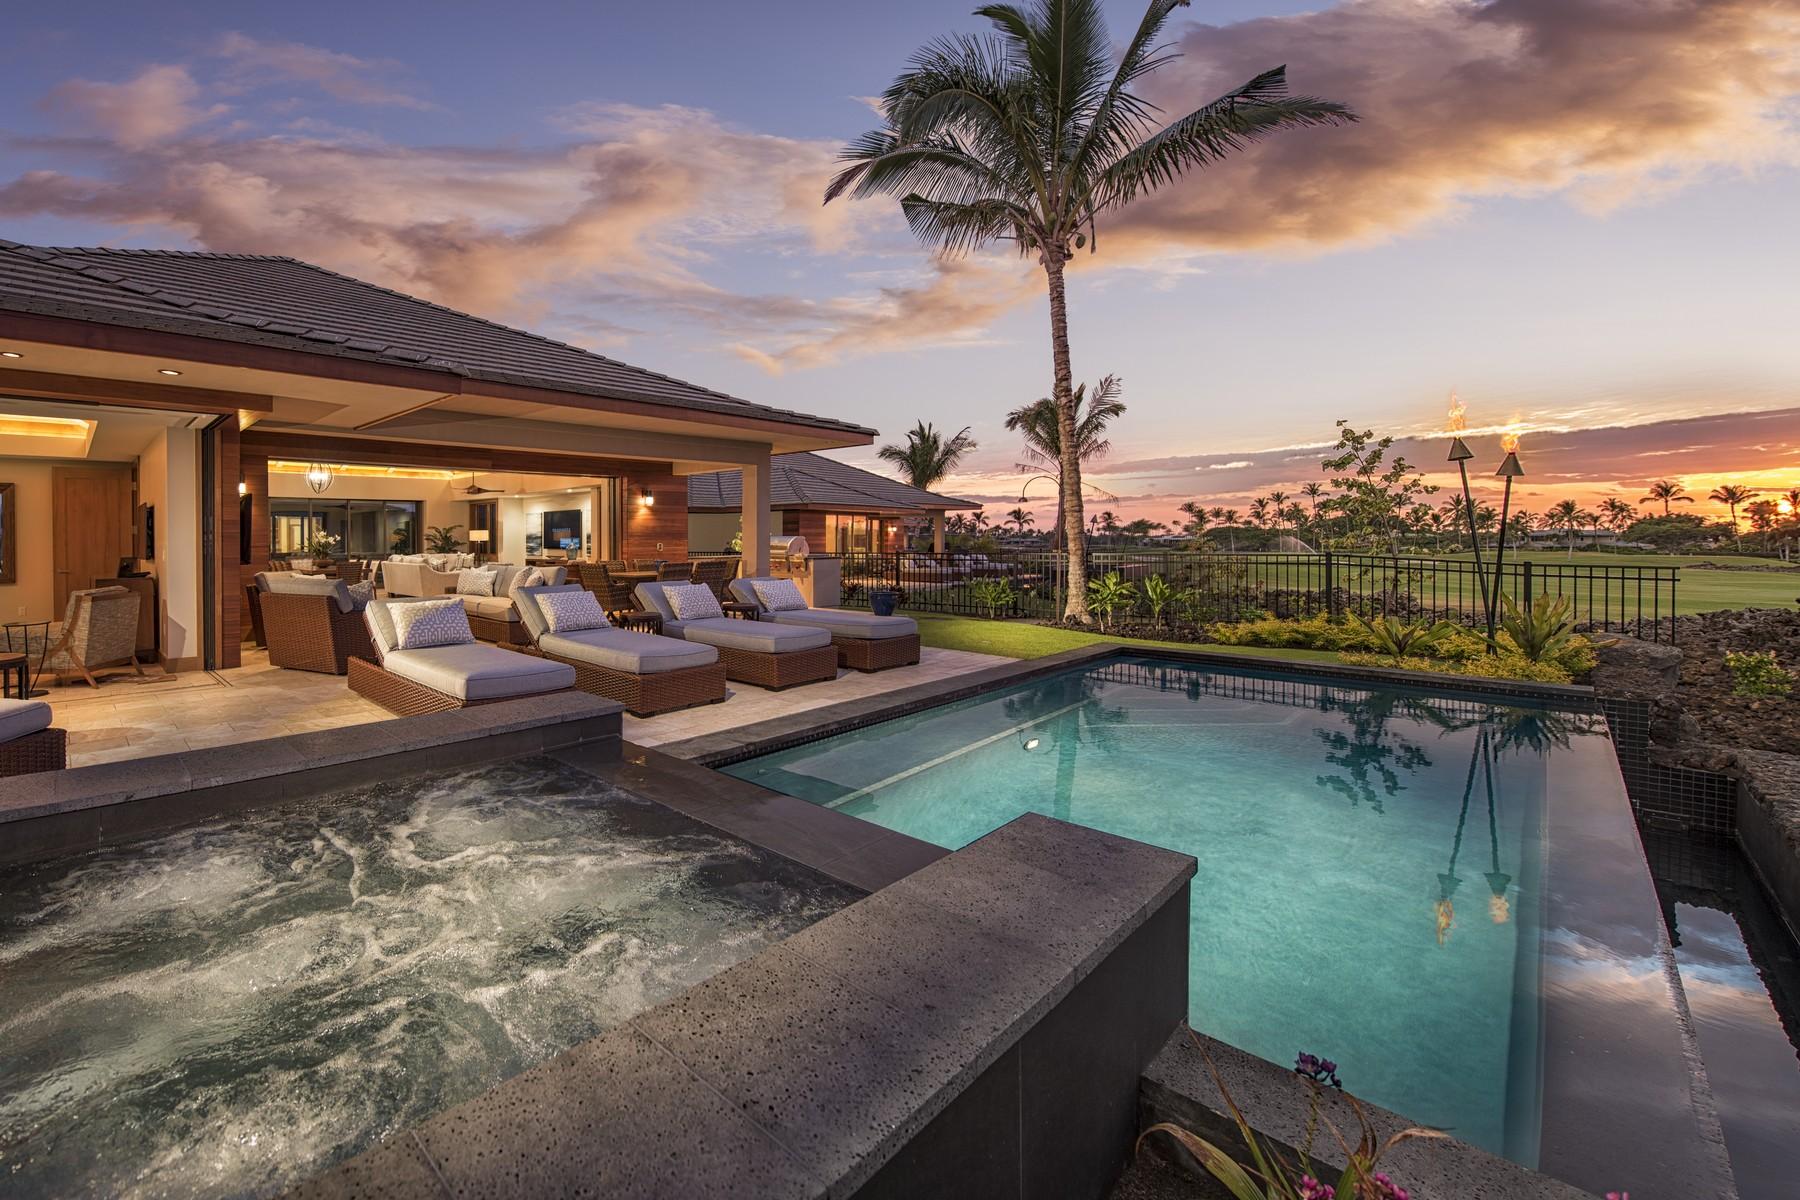 Single Family Homes for Active at Residences of LauLea 68-1210 S. Kaniku Alanui #5A2 Kamuela, Hawaii 96743 United States